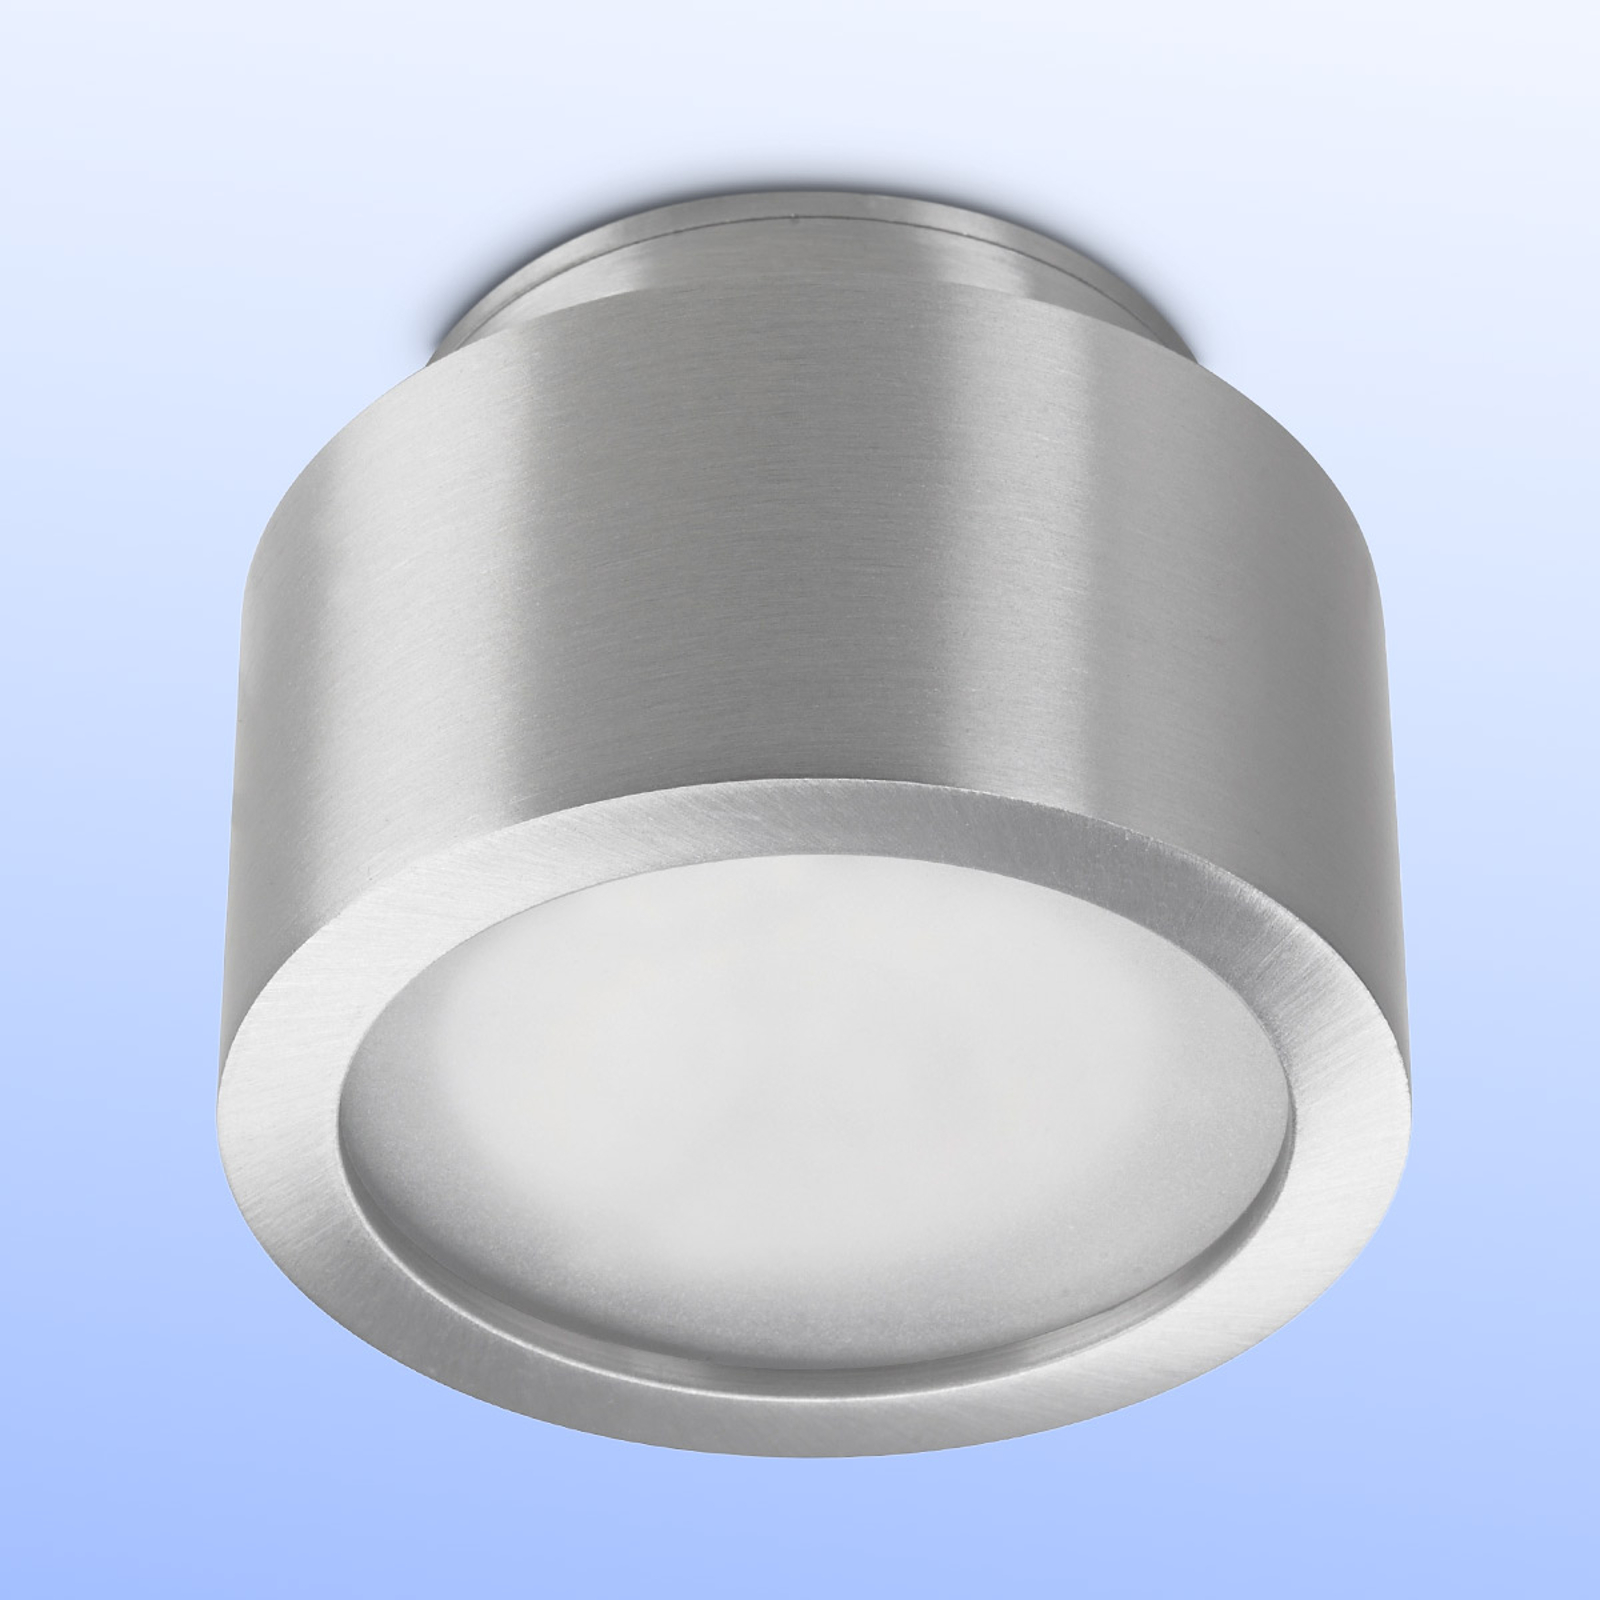 Miniplafon - plafonnier de salle de bain avec LED